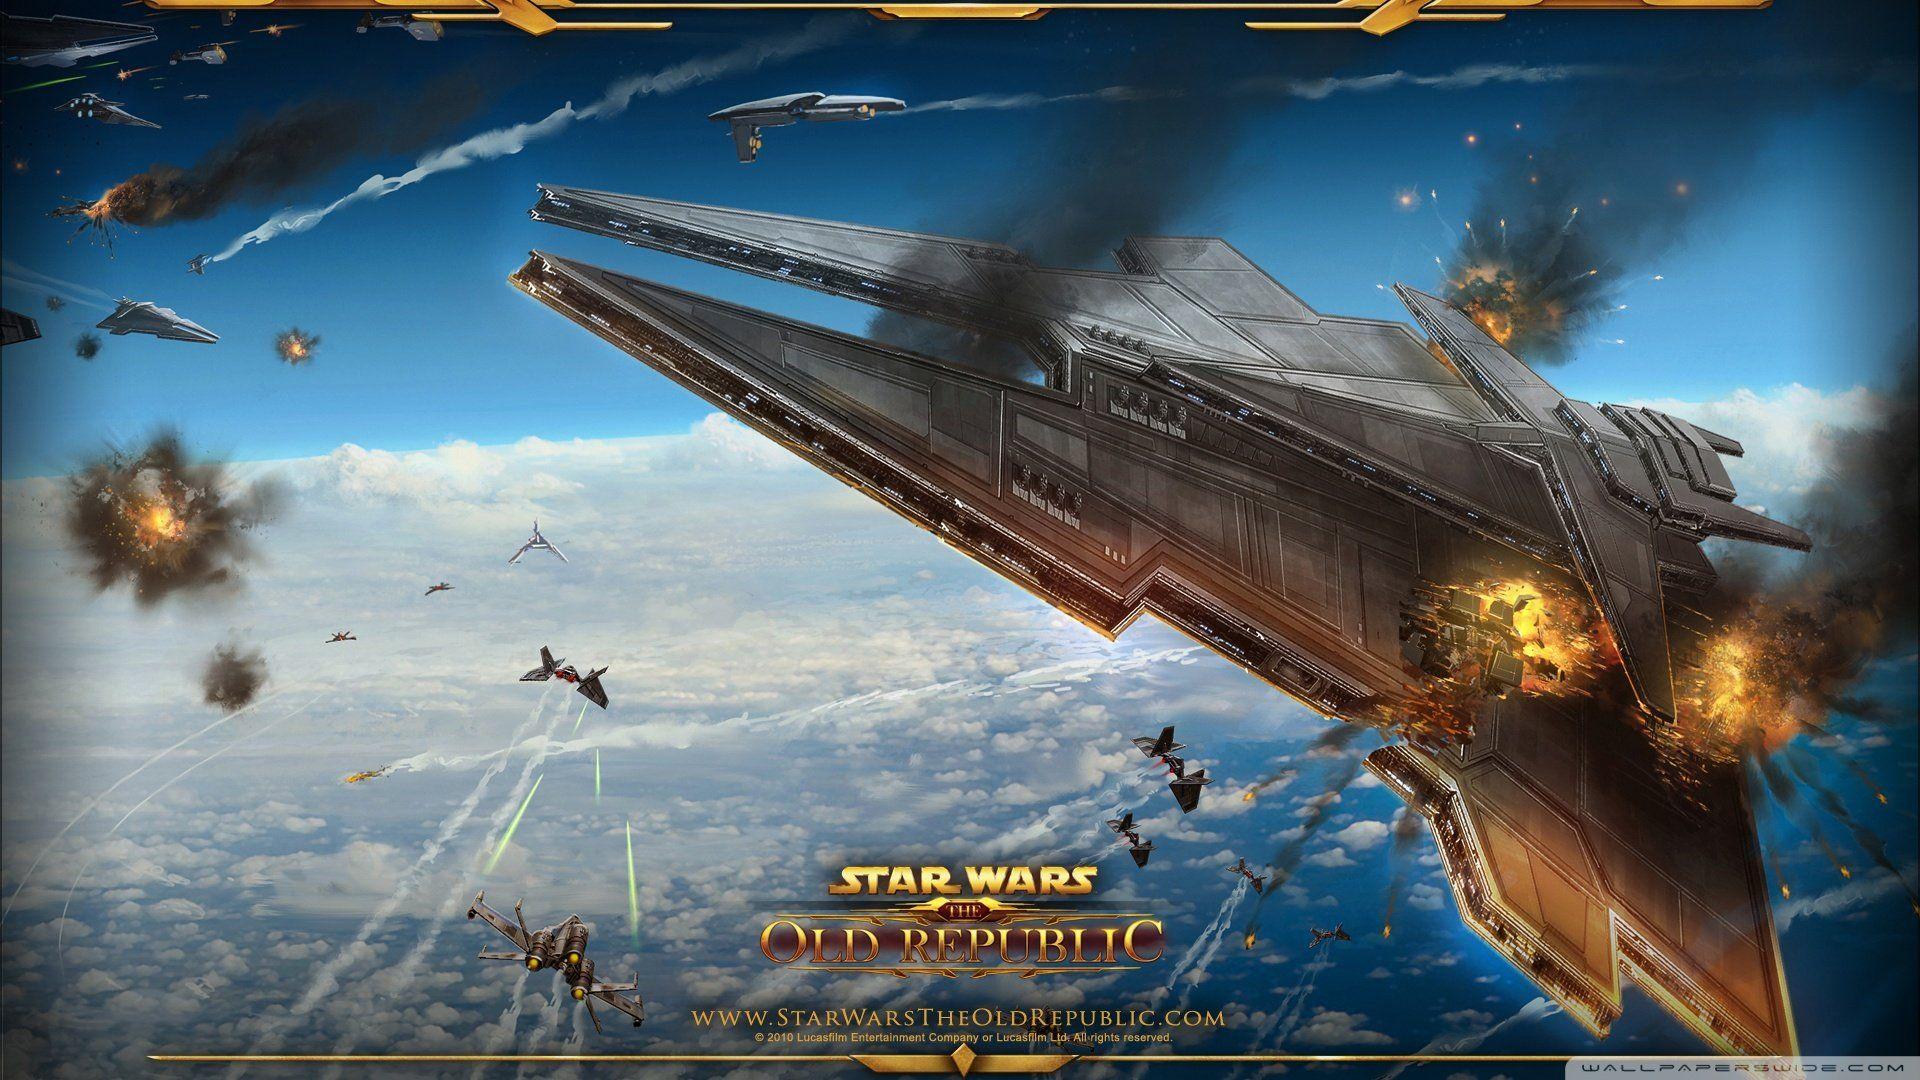 Star Wars The Old Republic Wallpaper Wallpaper Star Wars The Old Star Wars Wallpaper Star Wars